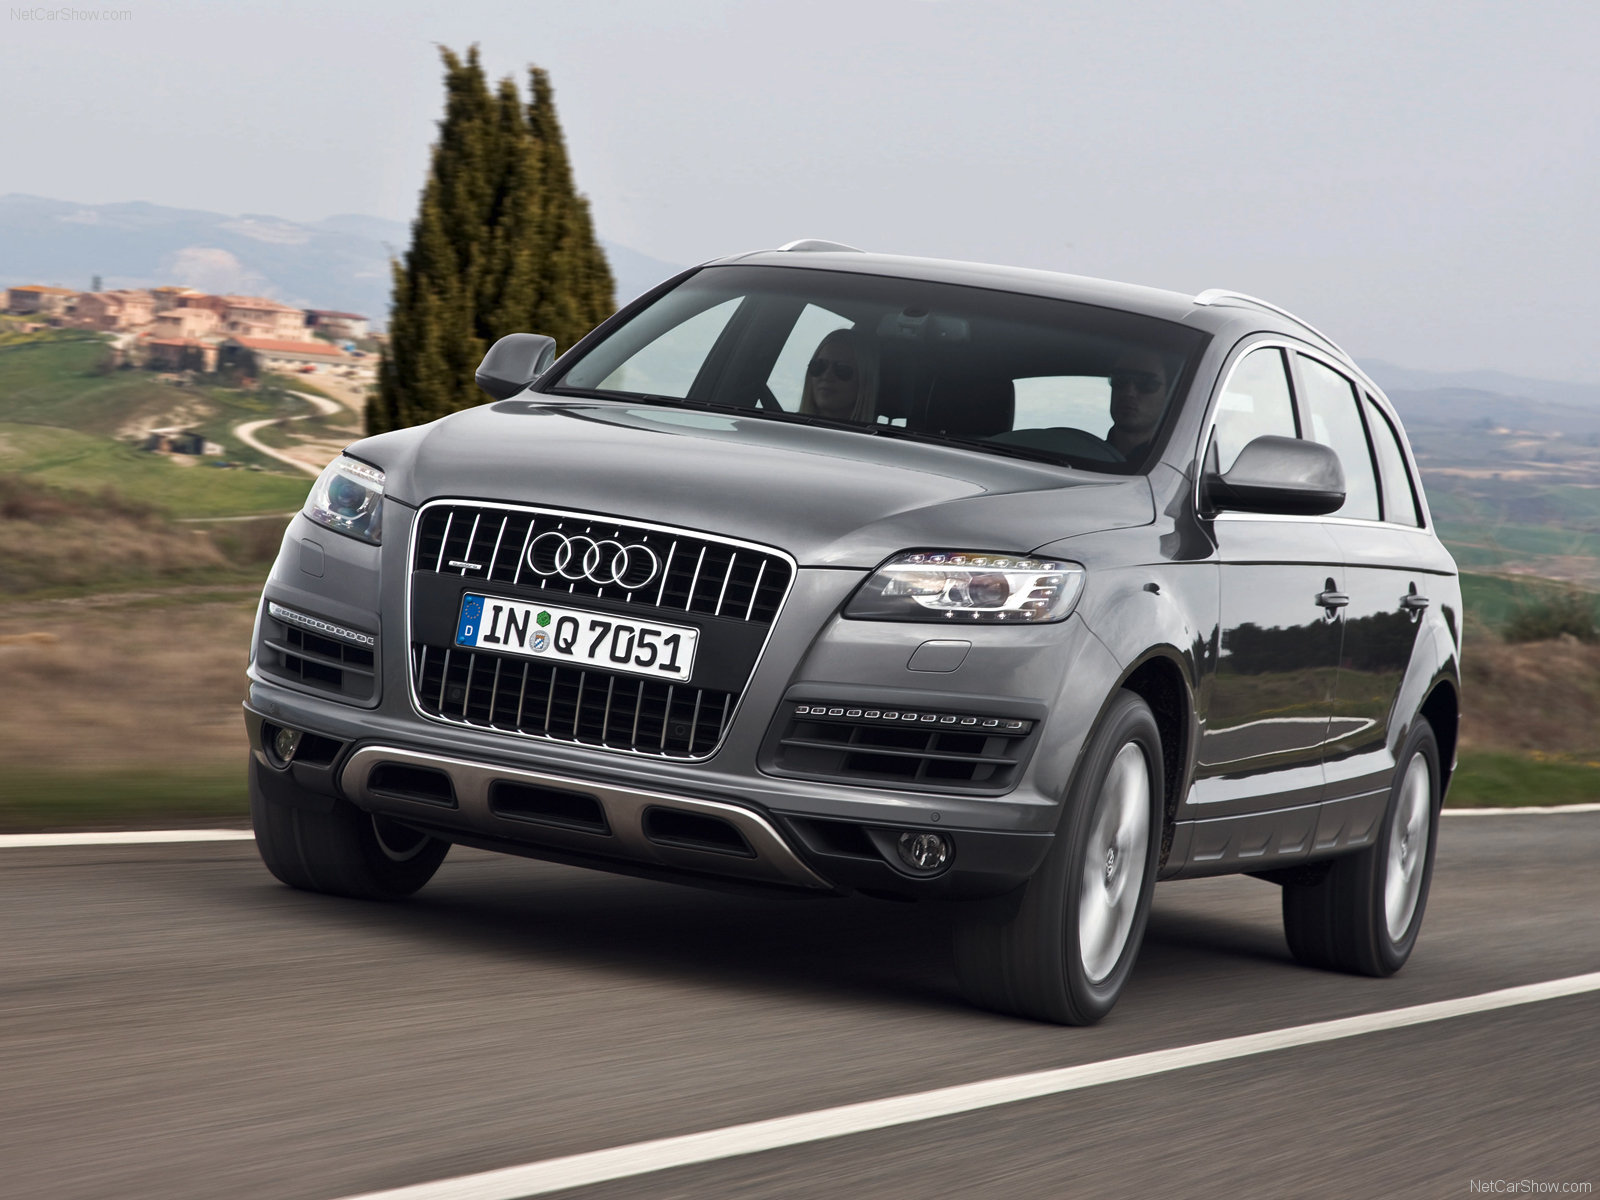 pic link: http://www.carsbase.com/photo/Audi-Q7_mp4_pic_63548.jpg